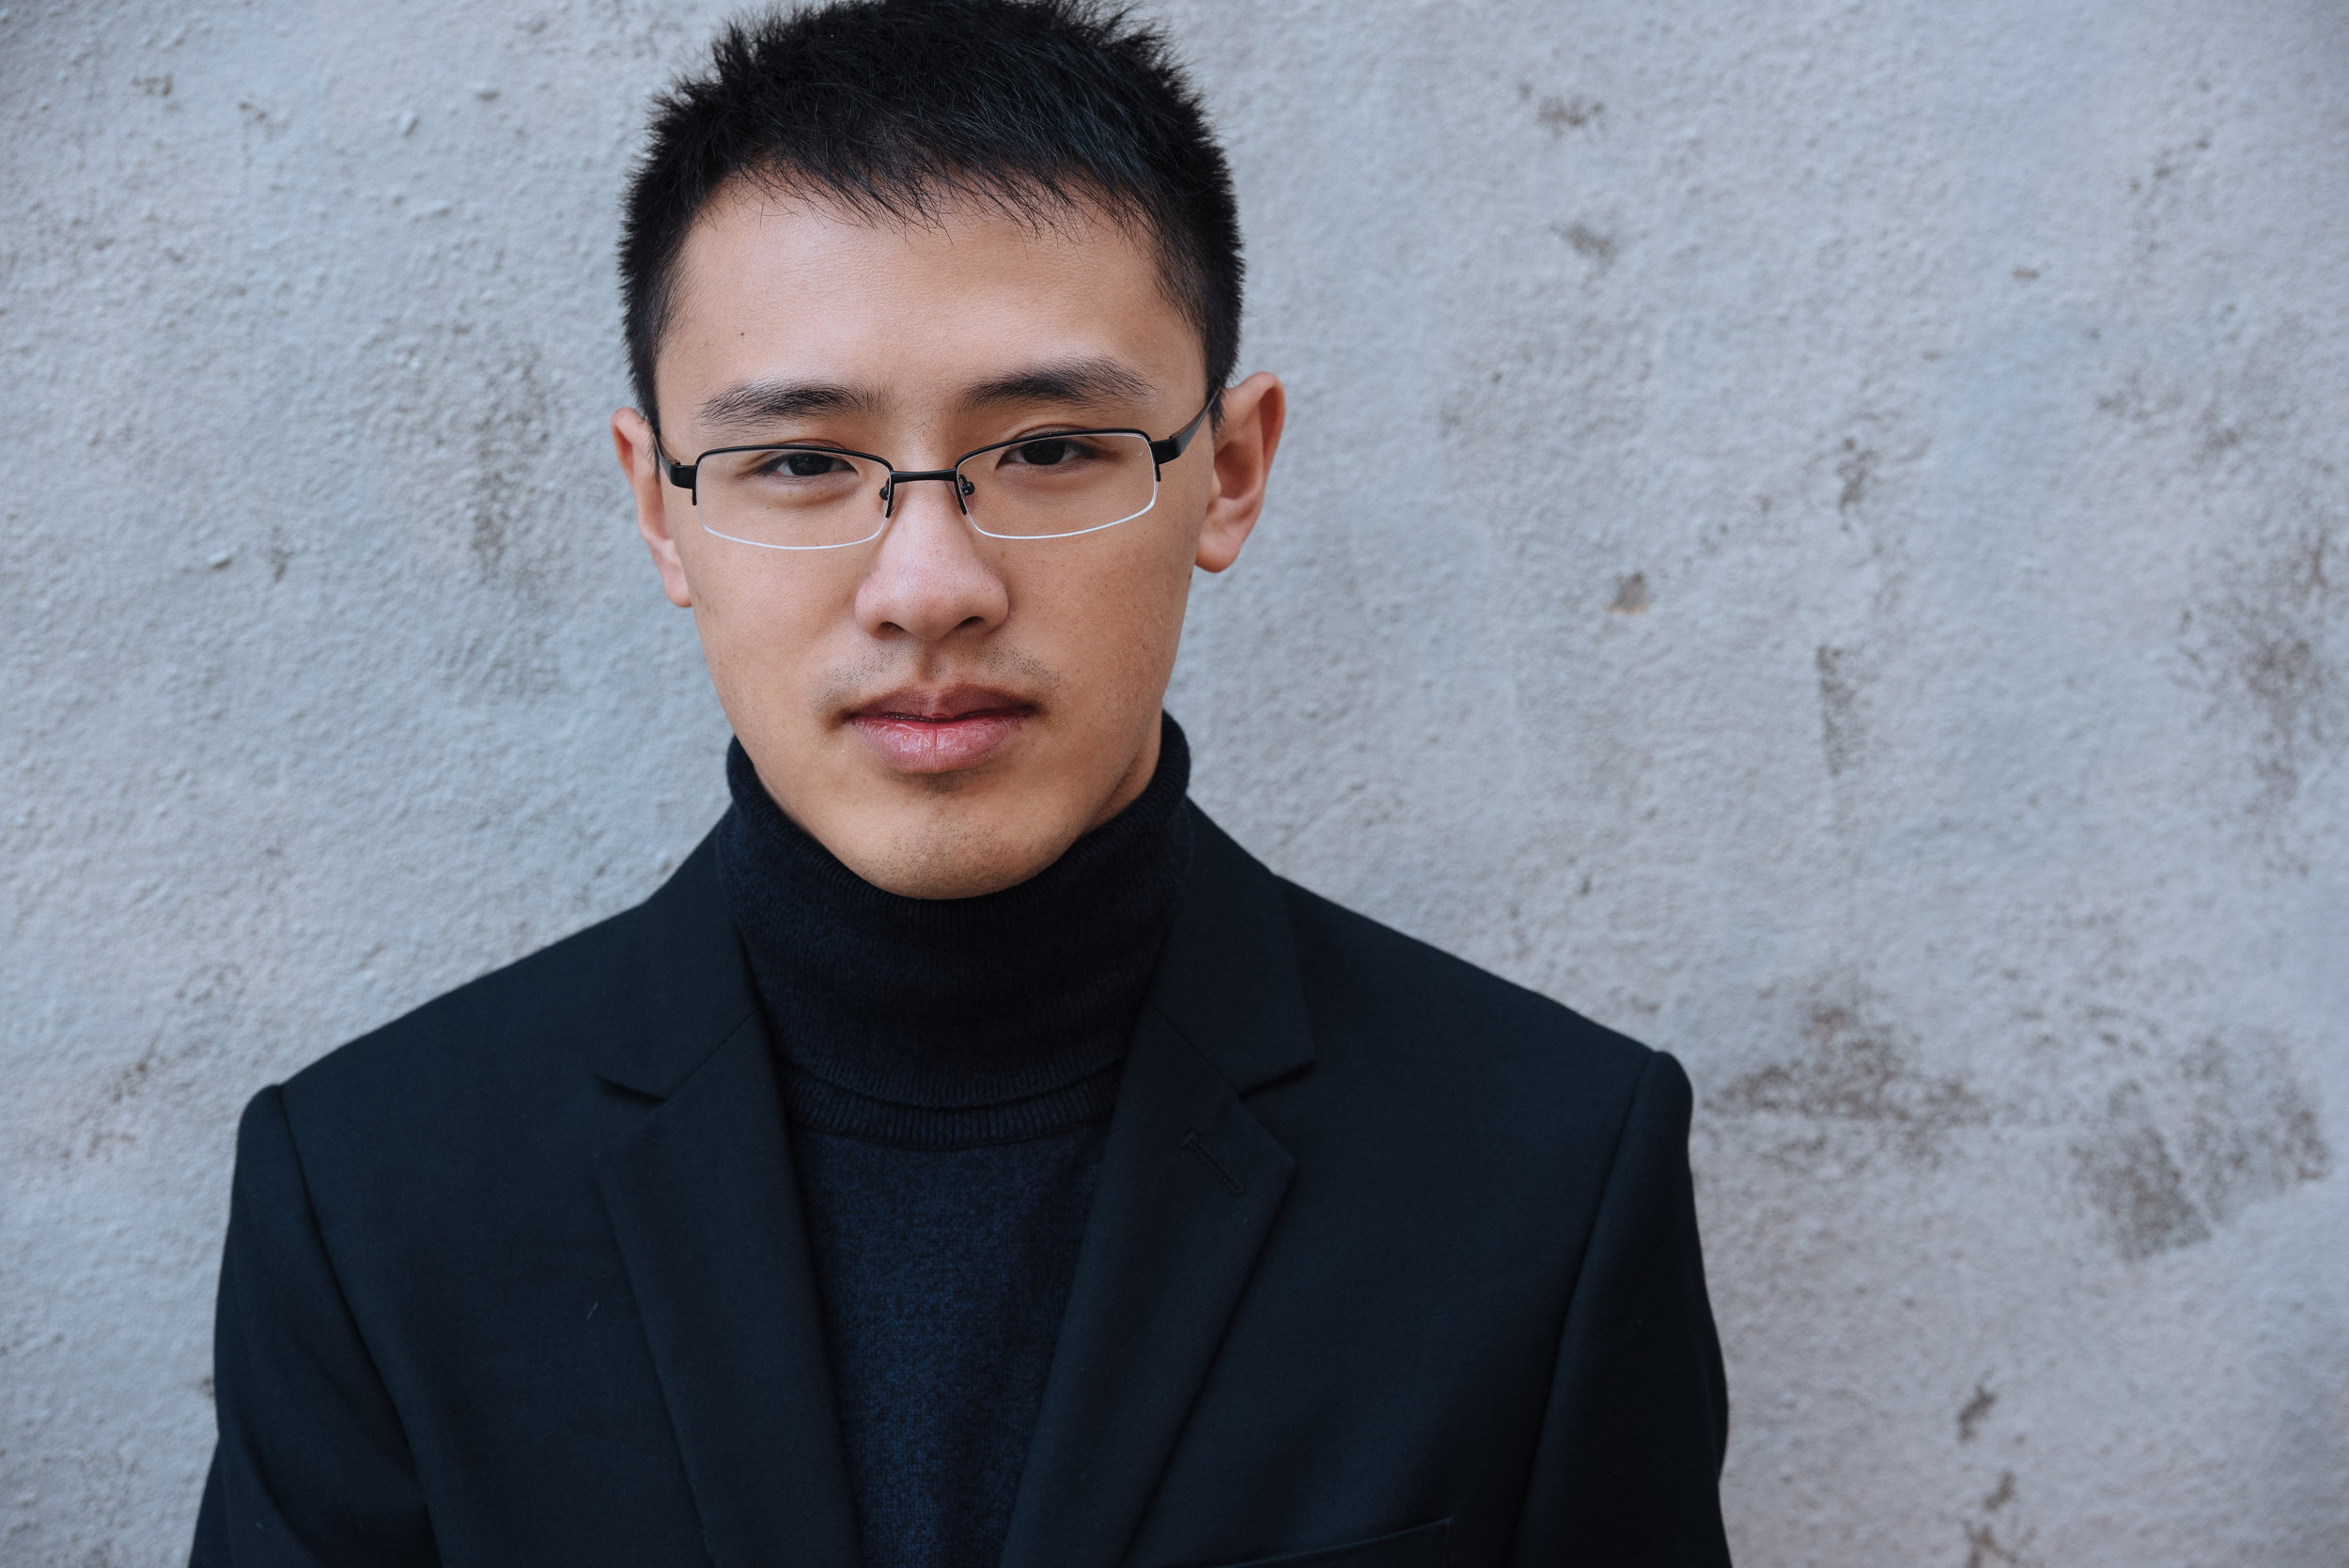 Max Tan  Artist Diploma at The Juilliard School  朱莉亚音乐学院小提琴助教和博士